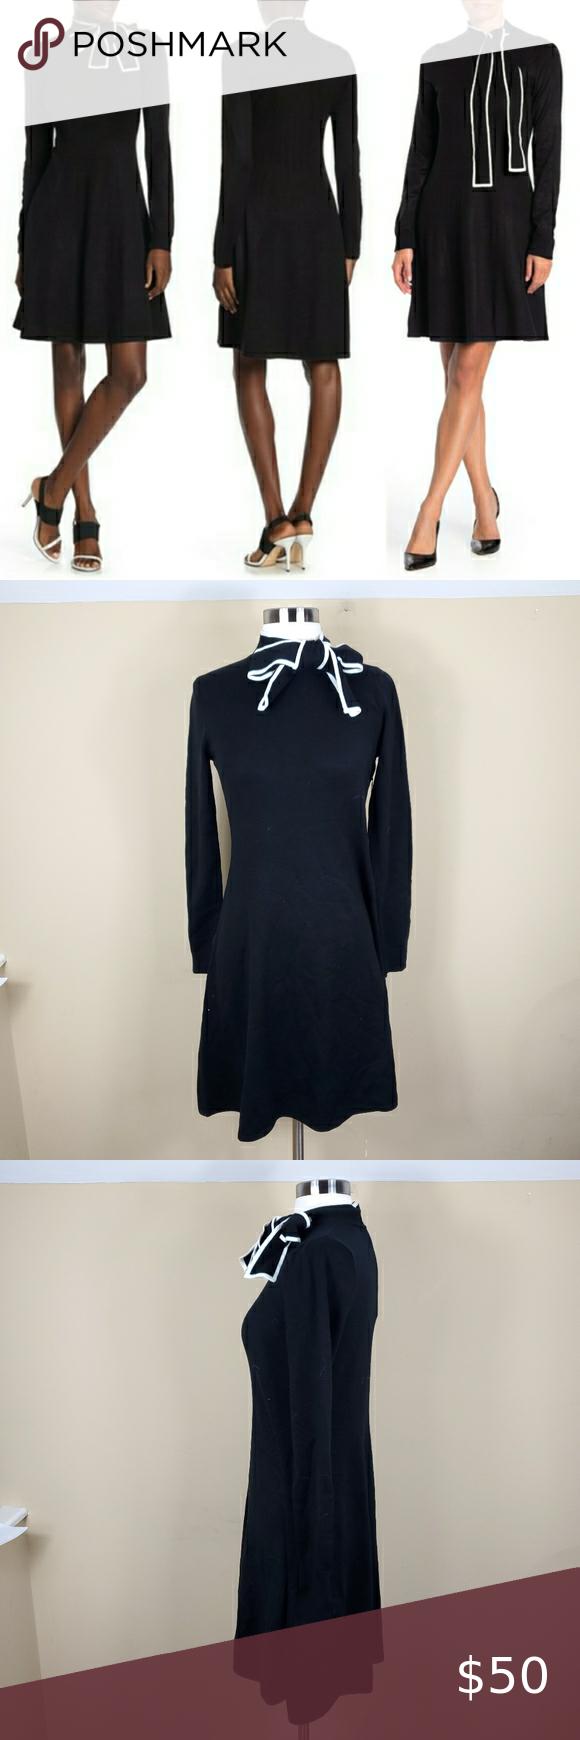 Vince Camuto Black Knit Bow Tie Neck Dress Tie Neck Dress Black Knit Knit Dress [ 1740 x 580 Pixel ]